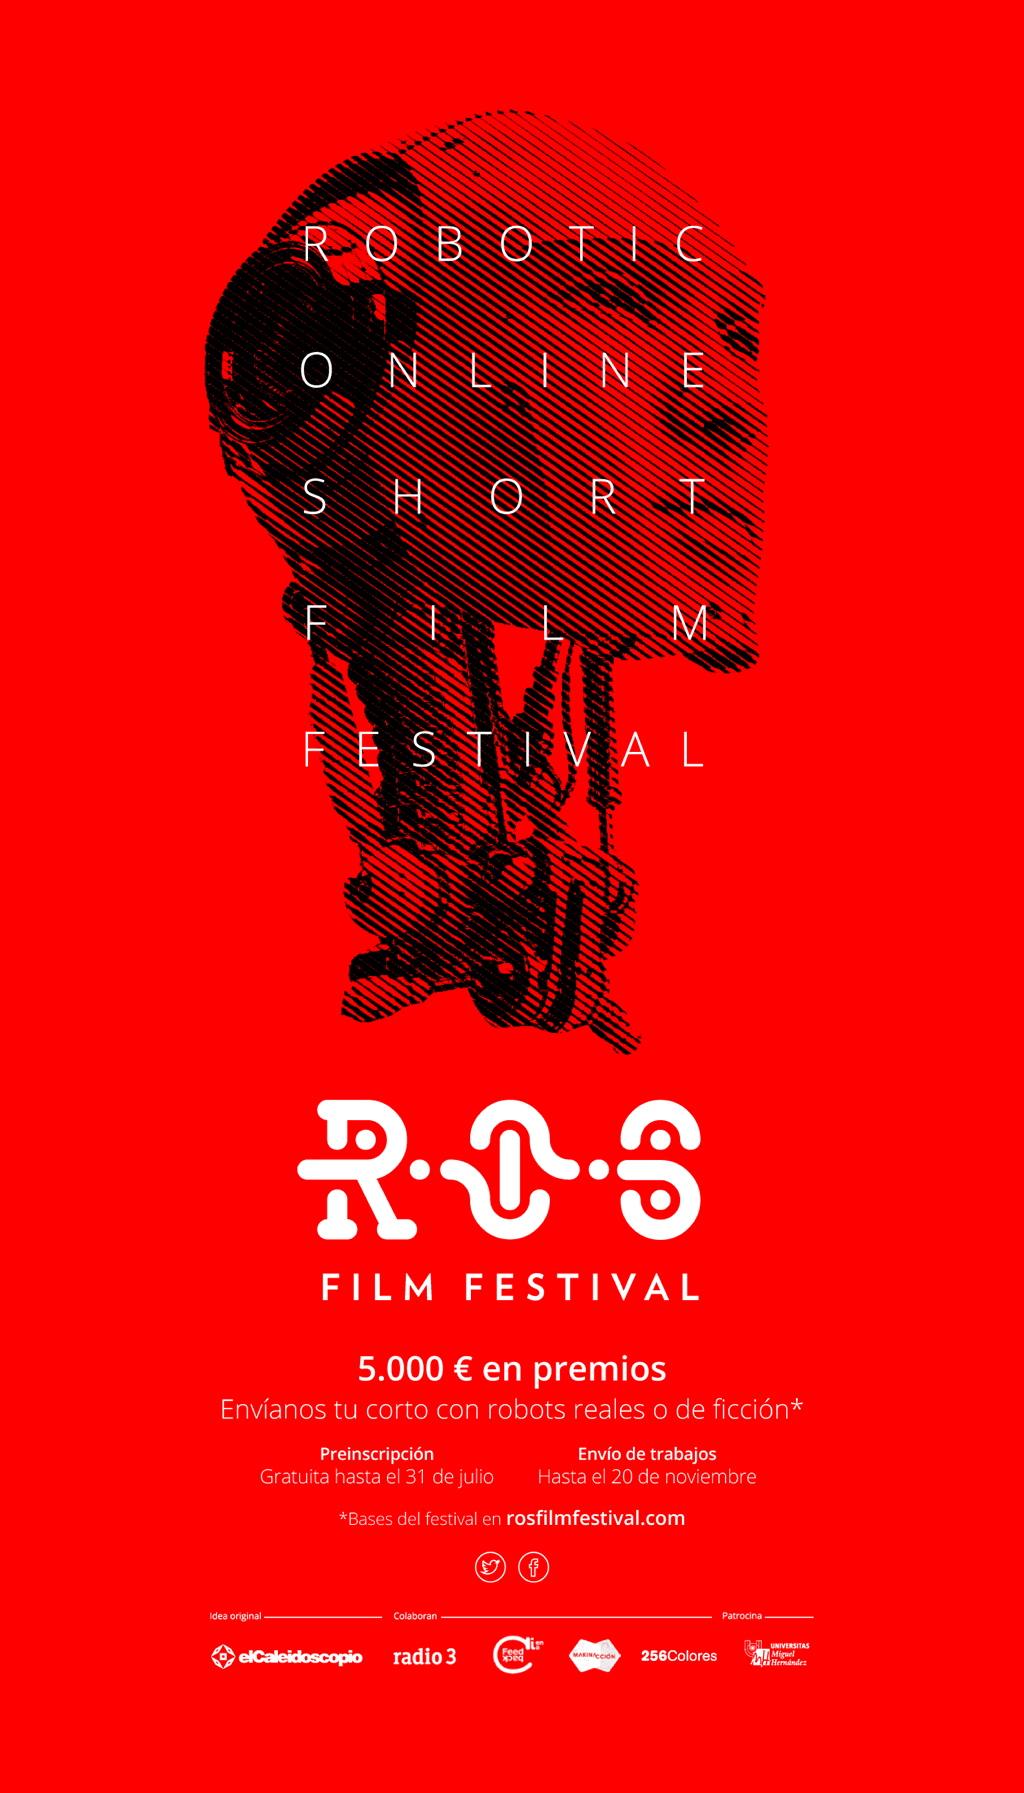 Inteligencia Artificial: Primer festival de cine robótico